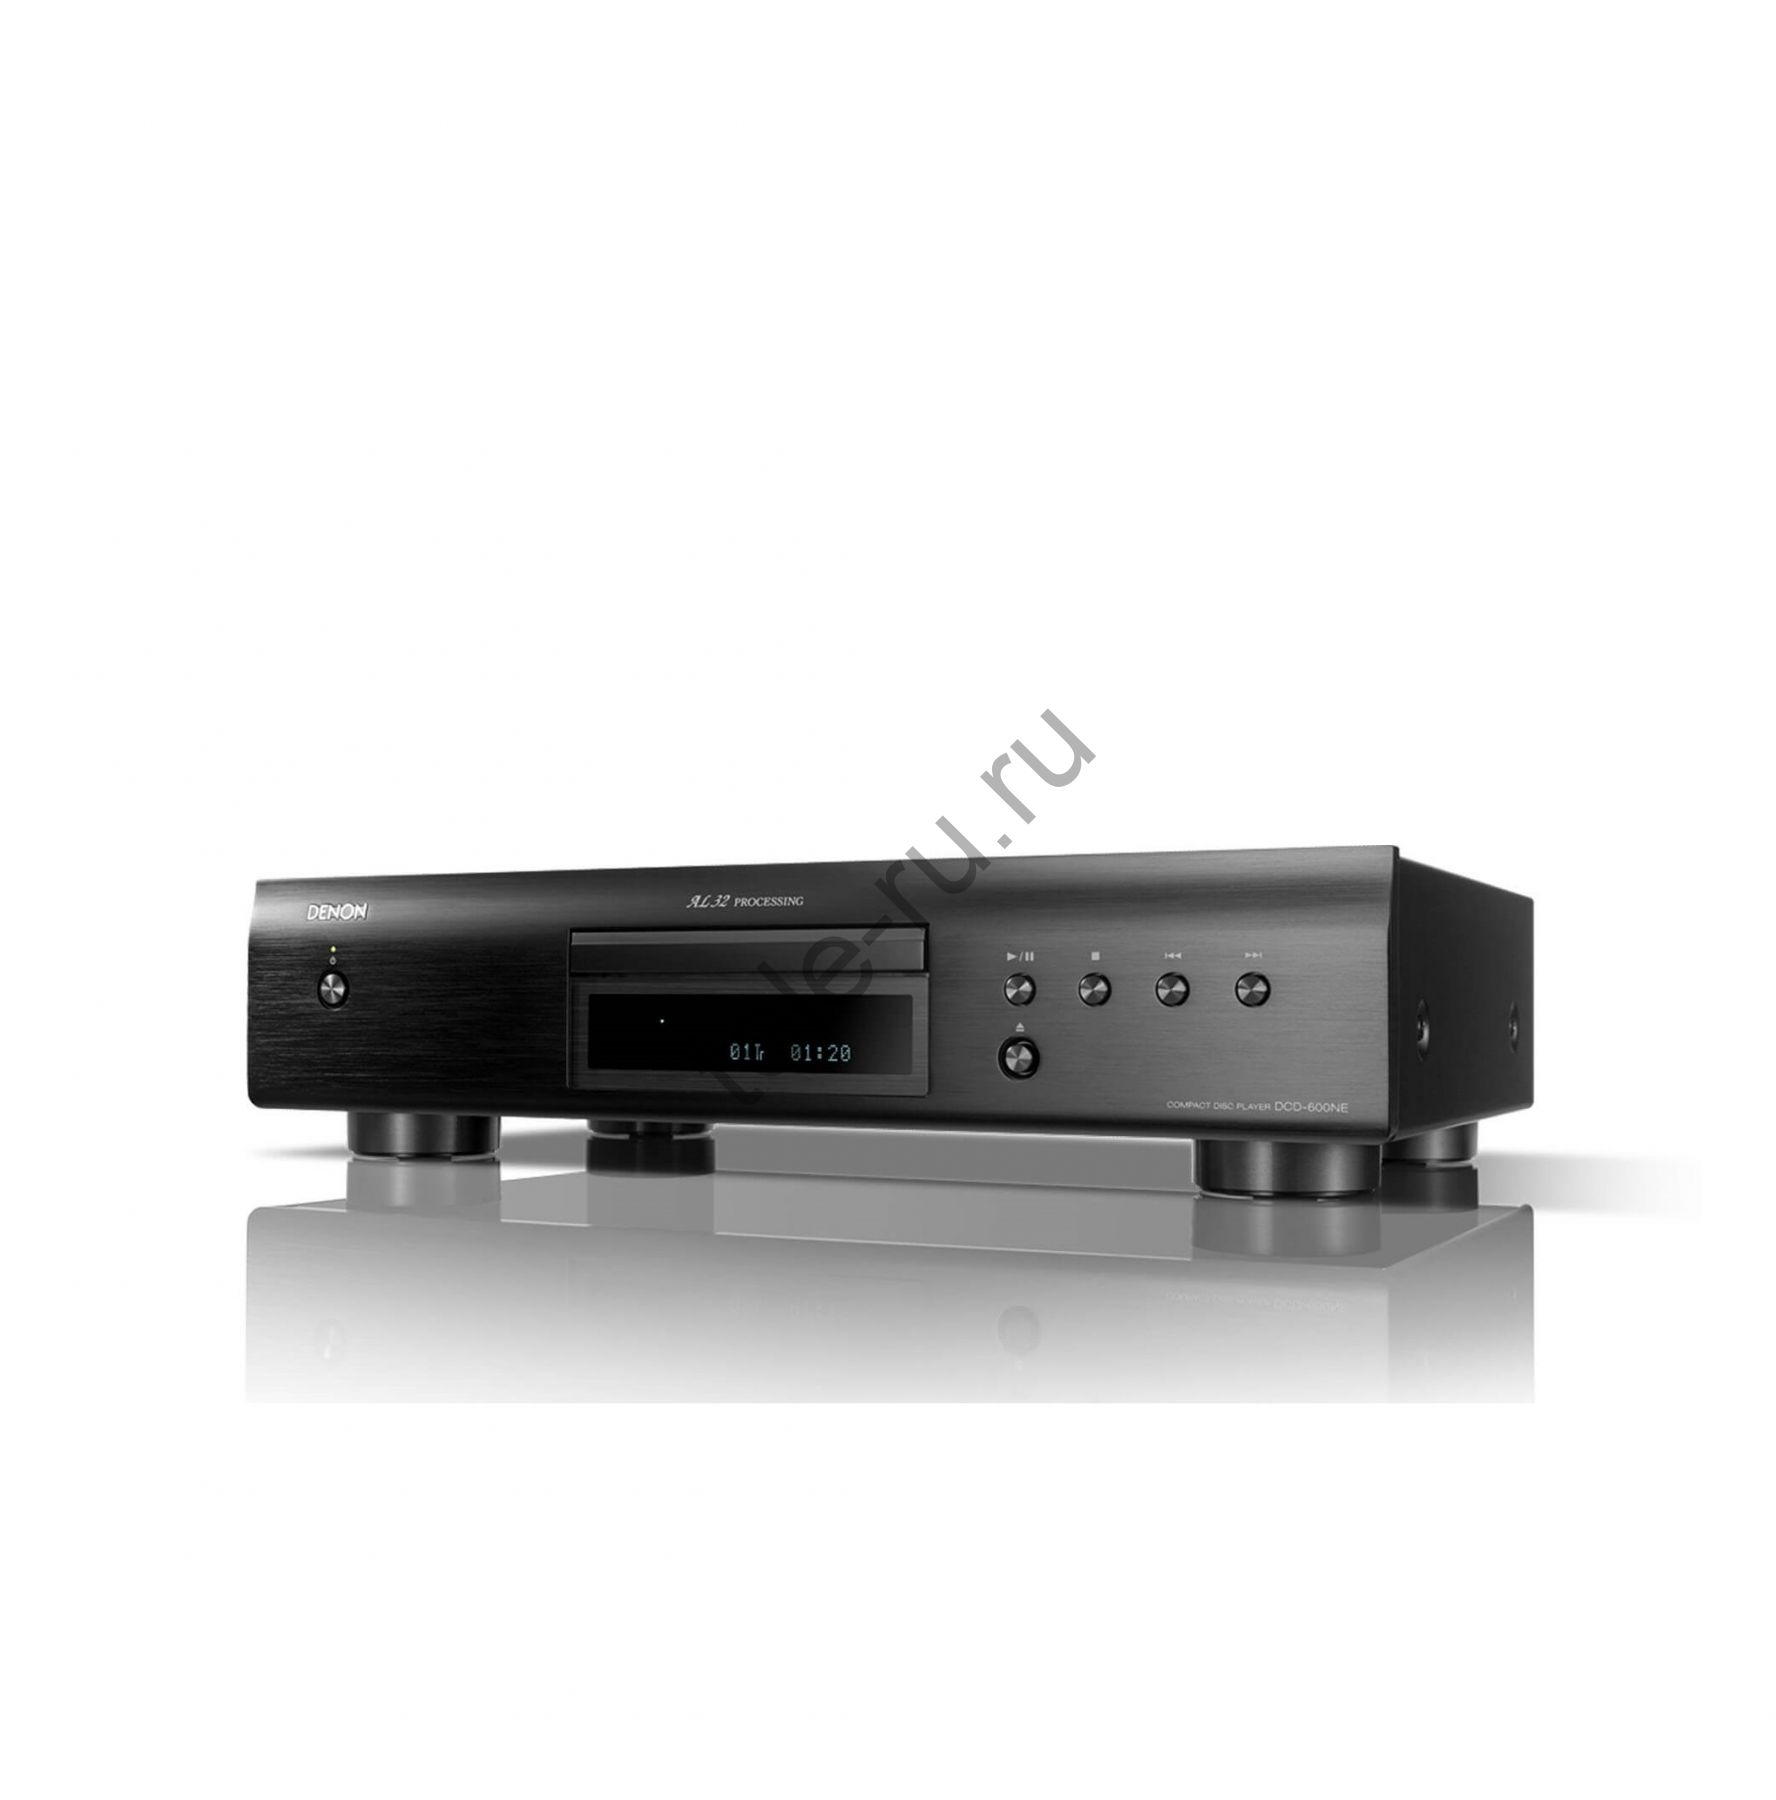 CD и SACD Проигрыватели DENON DCD-600NE, Black